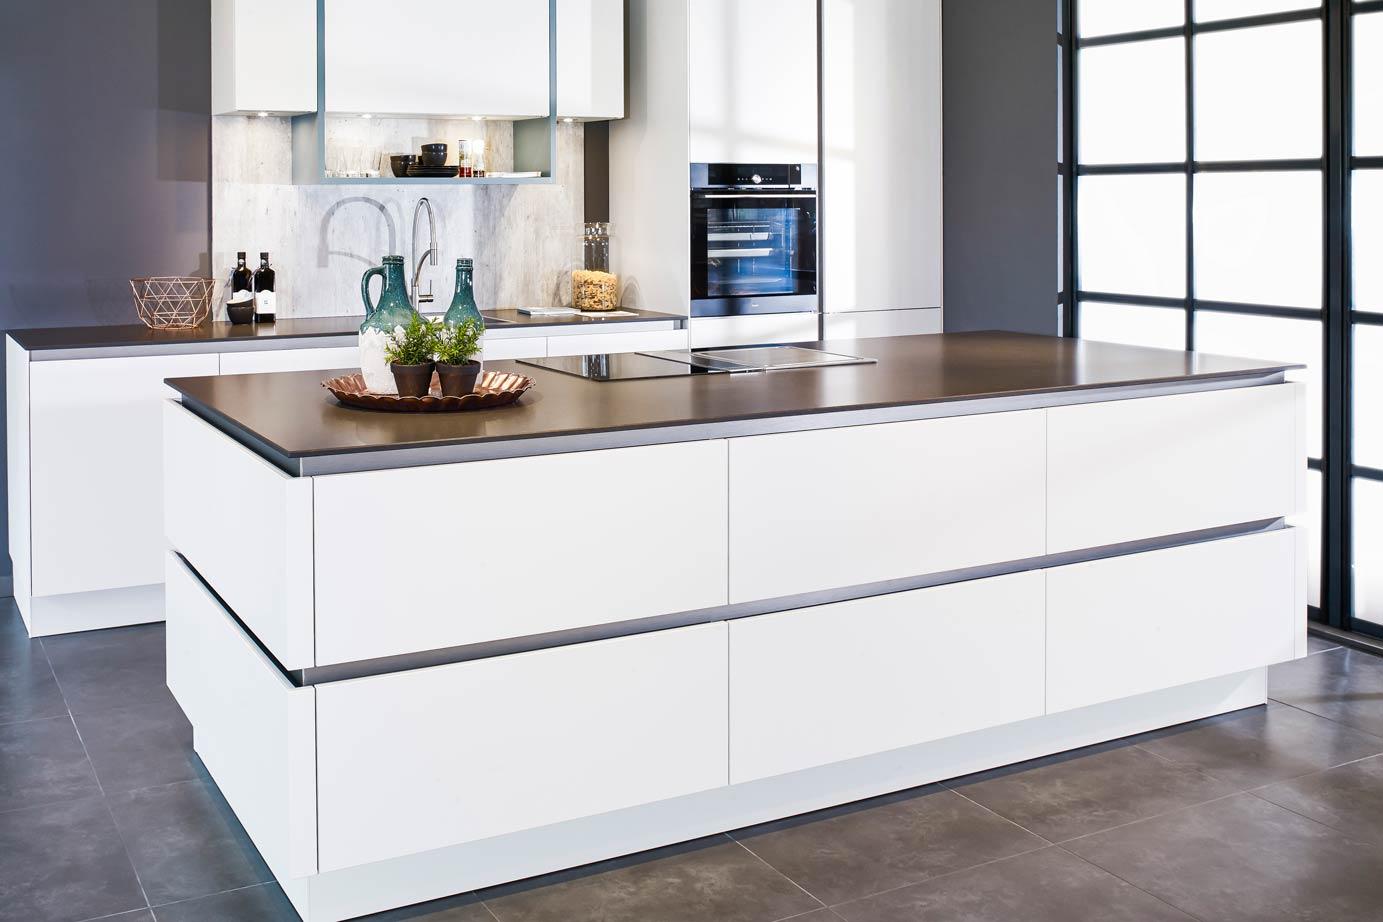 Witte keuken grijze muur classic badkamer kleur witte keuken witte